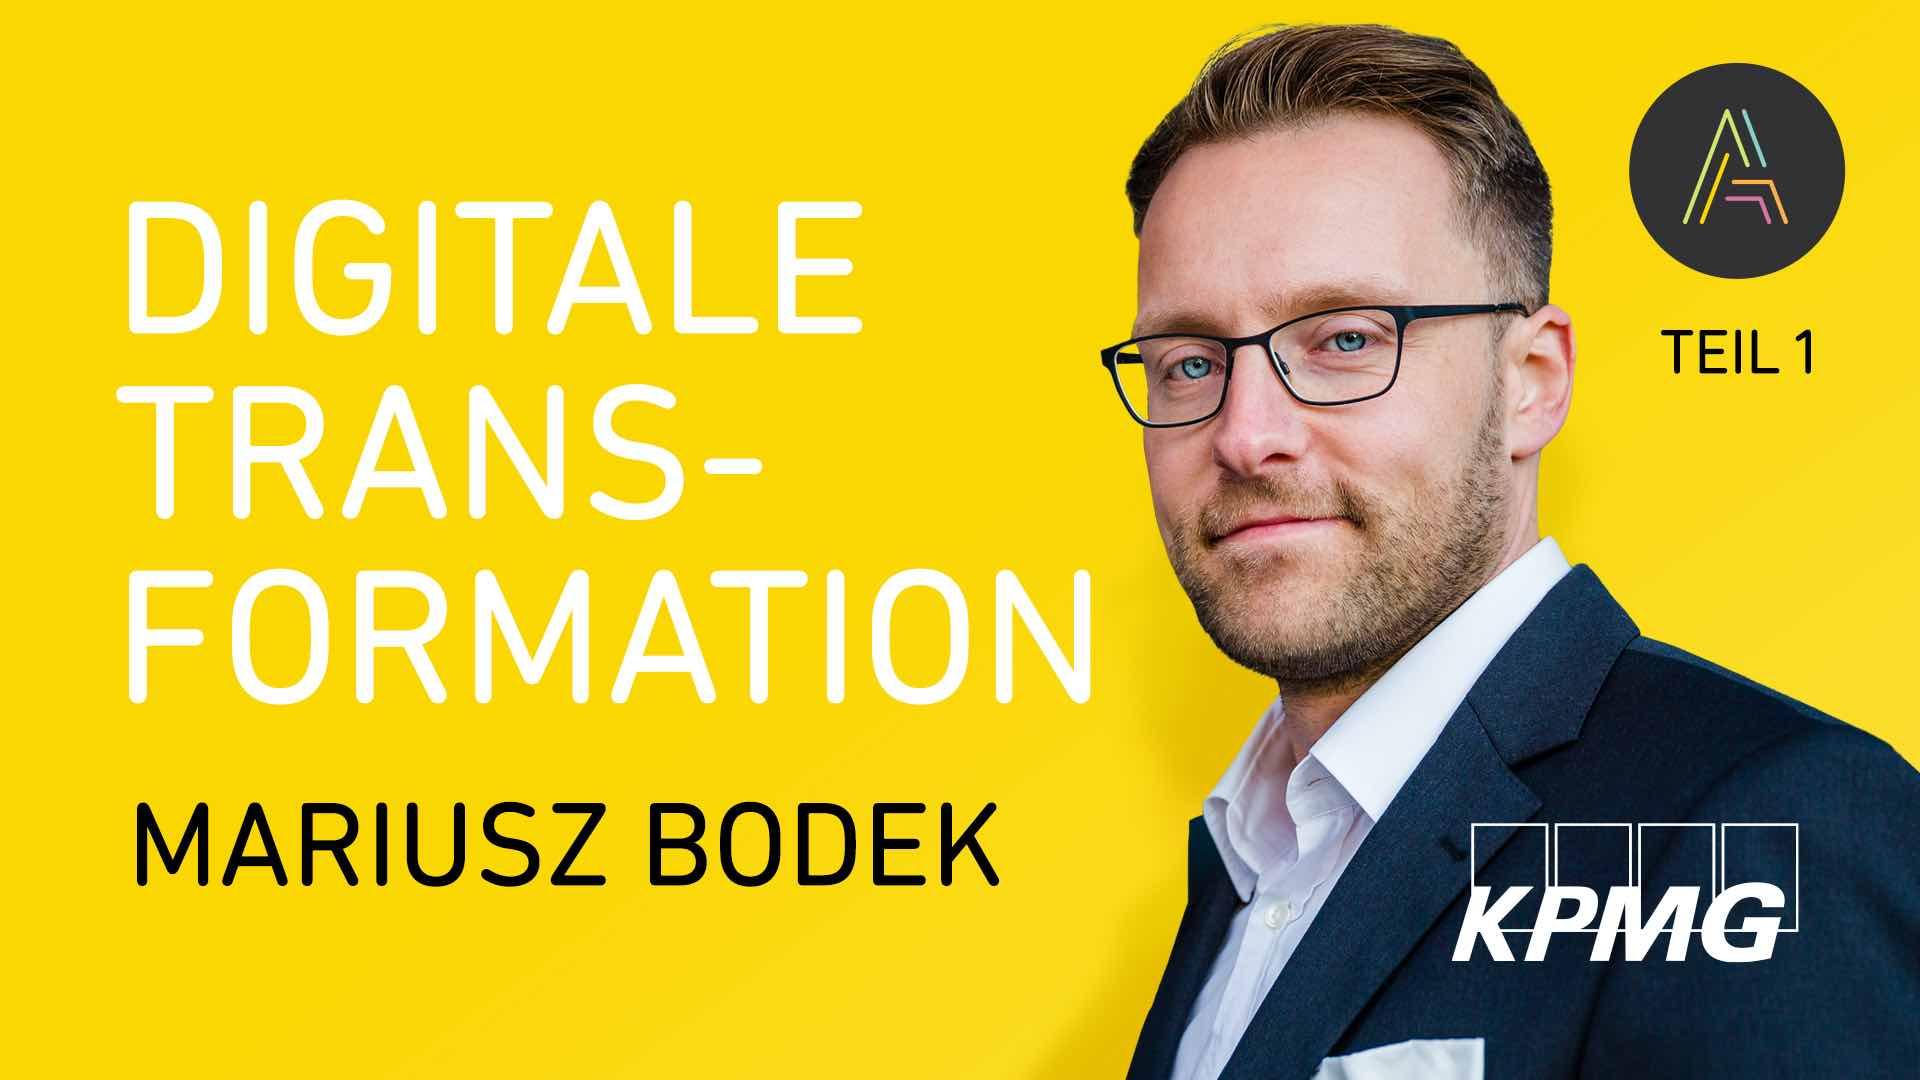 Mariusz Bodek